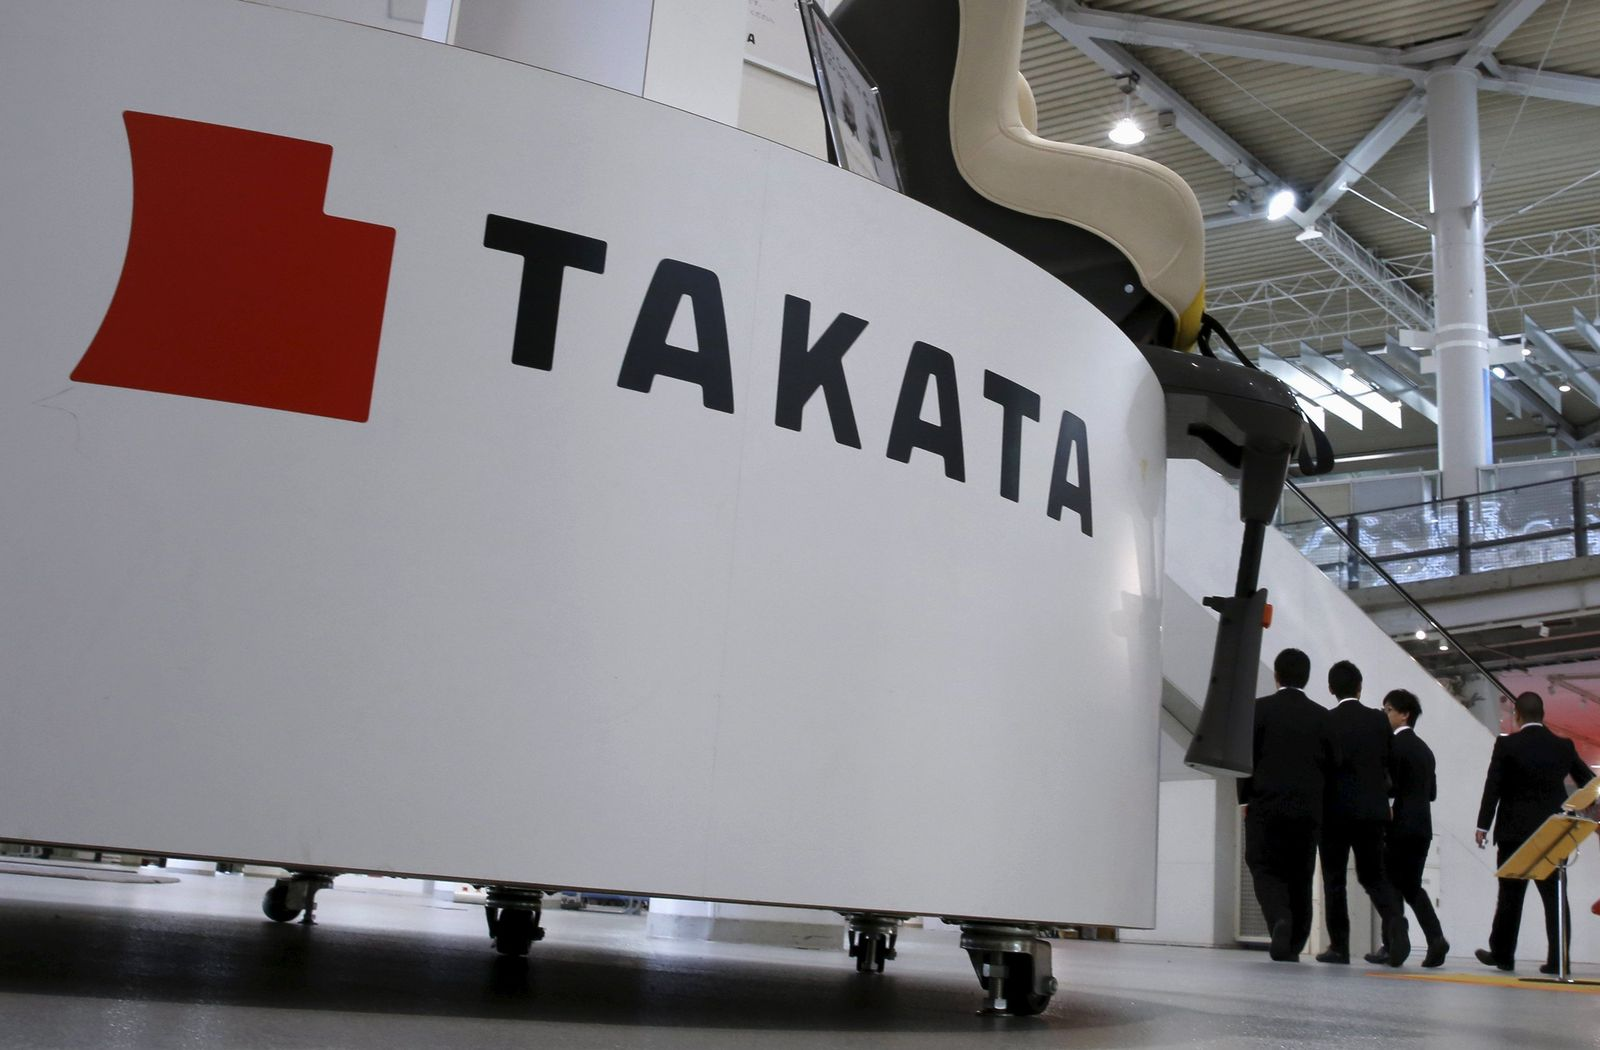 AUTOS-TAKATA/RESULTS